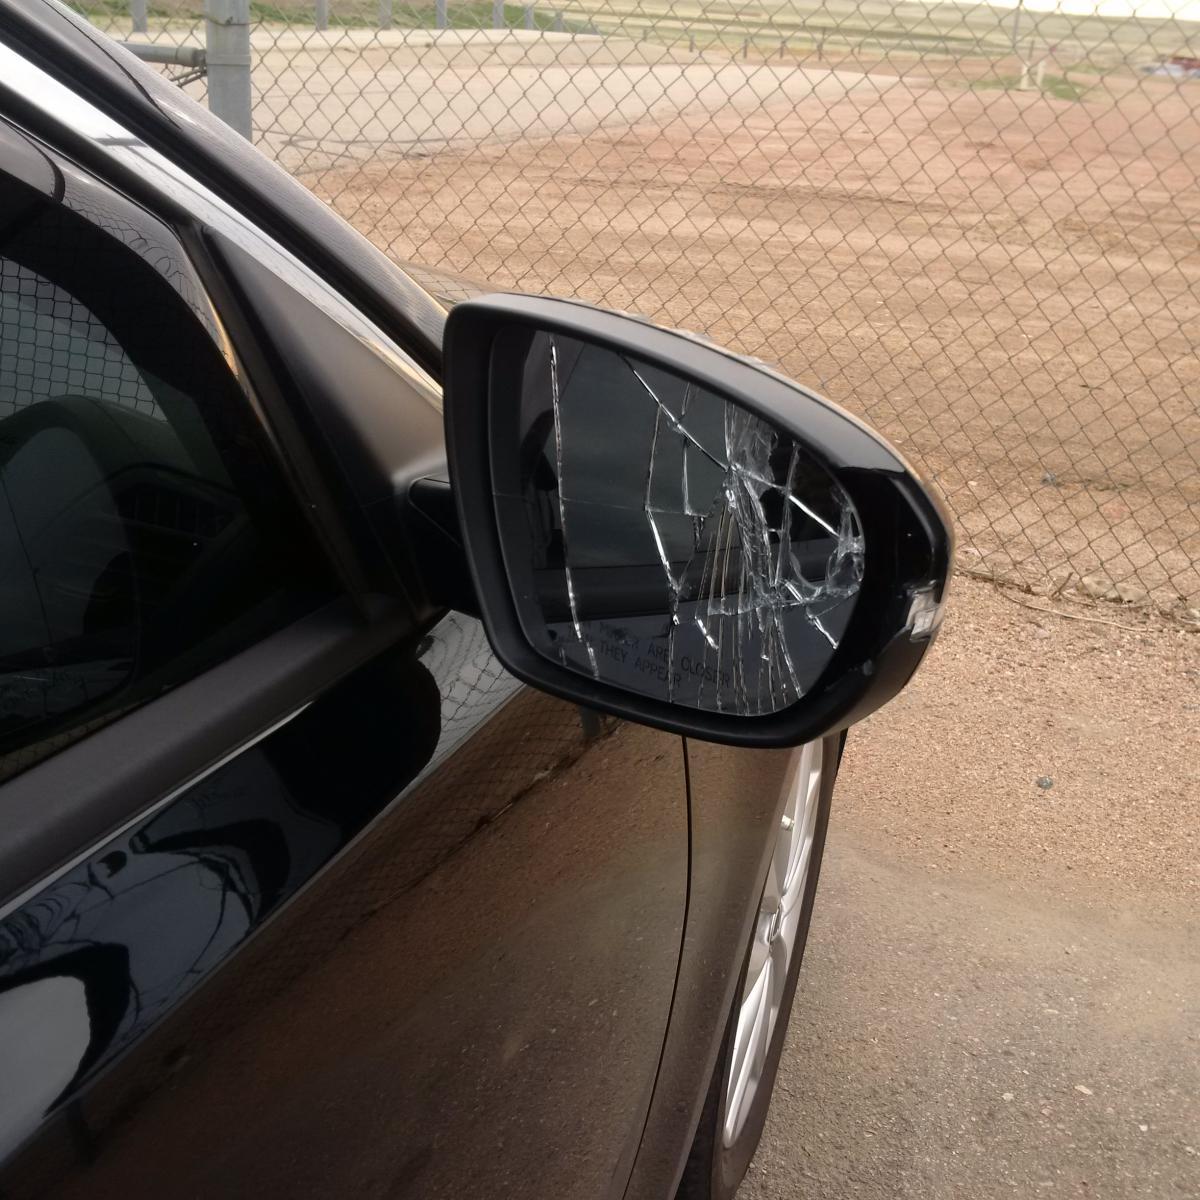 Someone hit my right side mirror img_20160423_074400 jpg